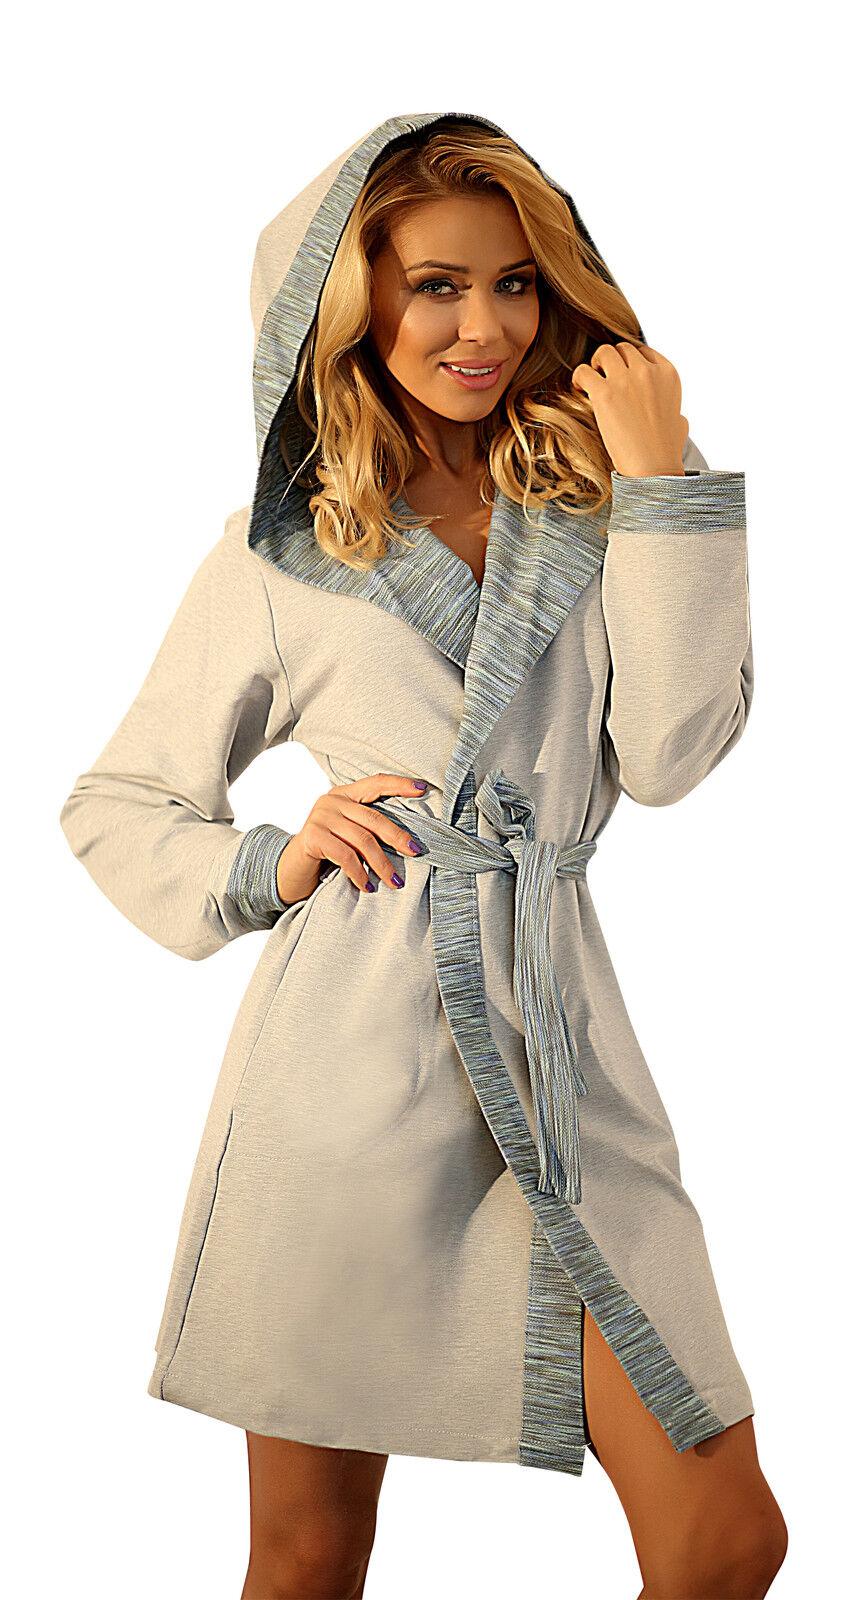 08ab20c6ee Womens Warm Hooded Housecoat Short Dressing Gown Cotton Soft Bathrobe Robe